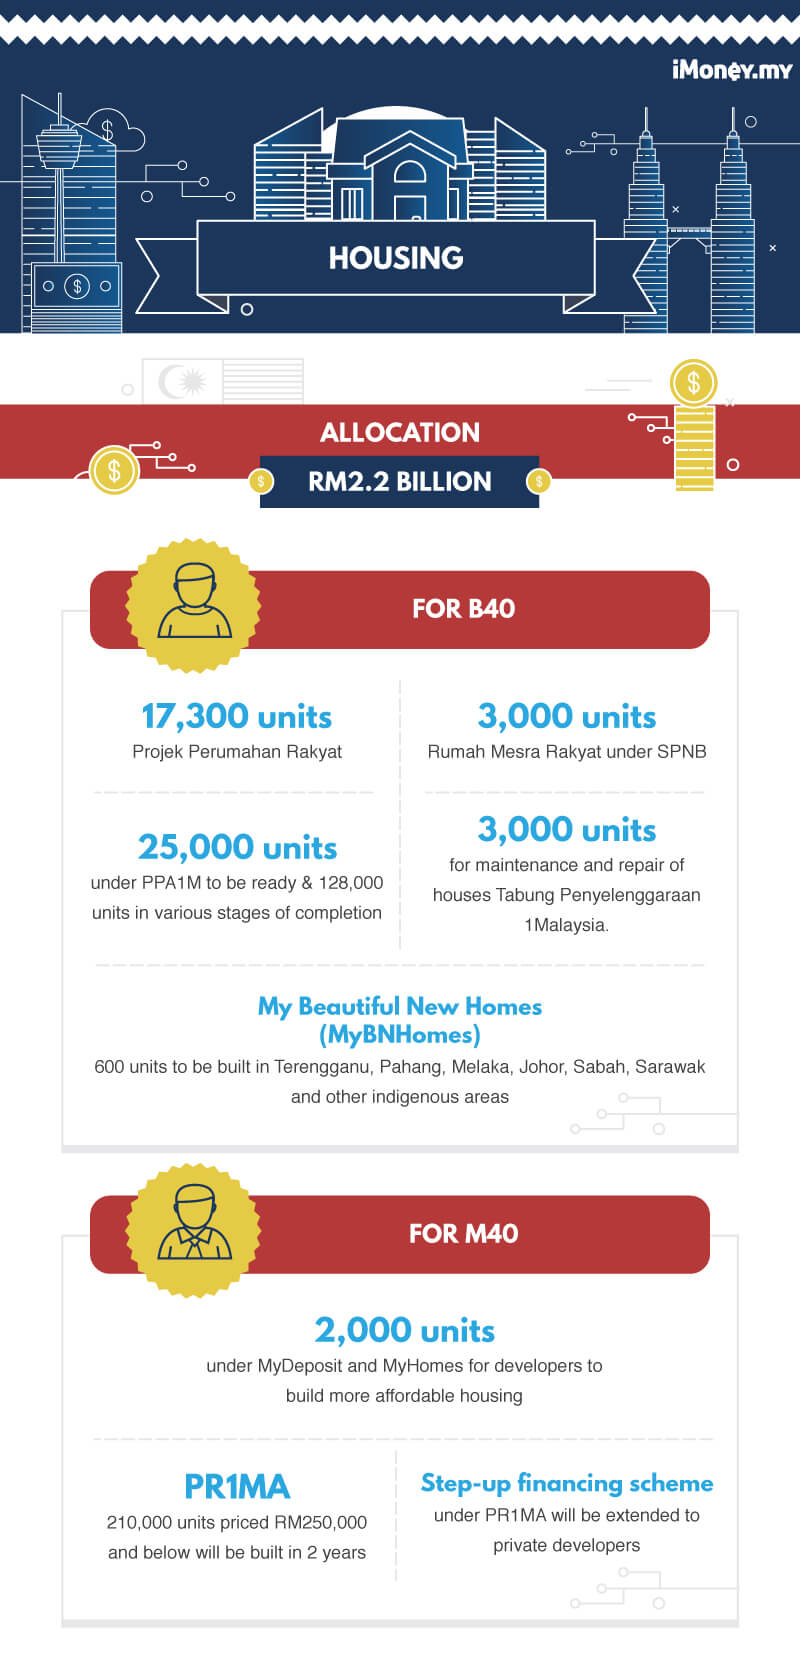 My 2018 Spring Capsule Wardrobe: Key Highlights Of Malaysia Budget 2018